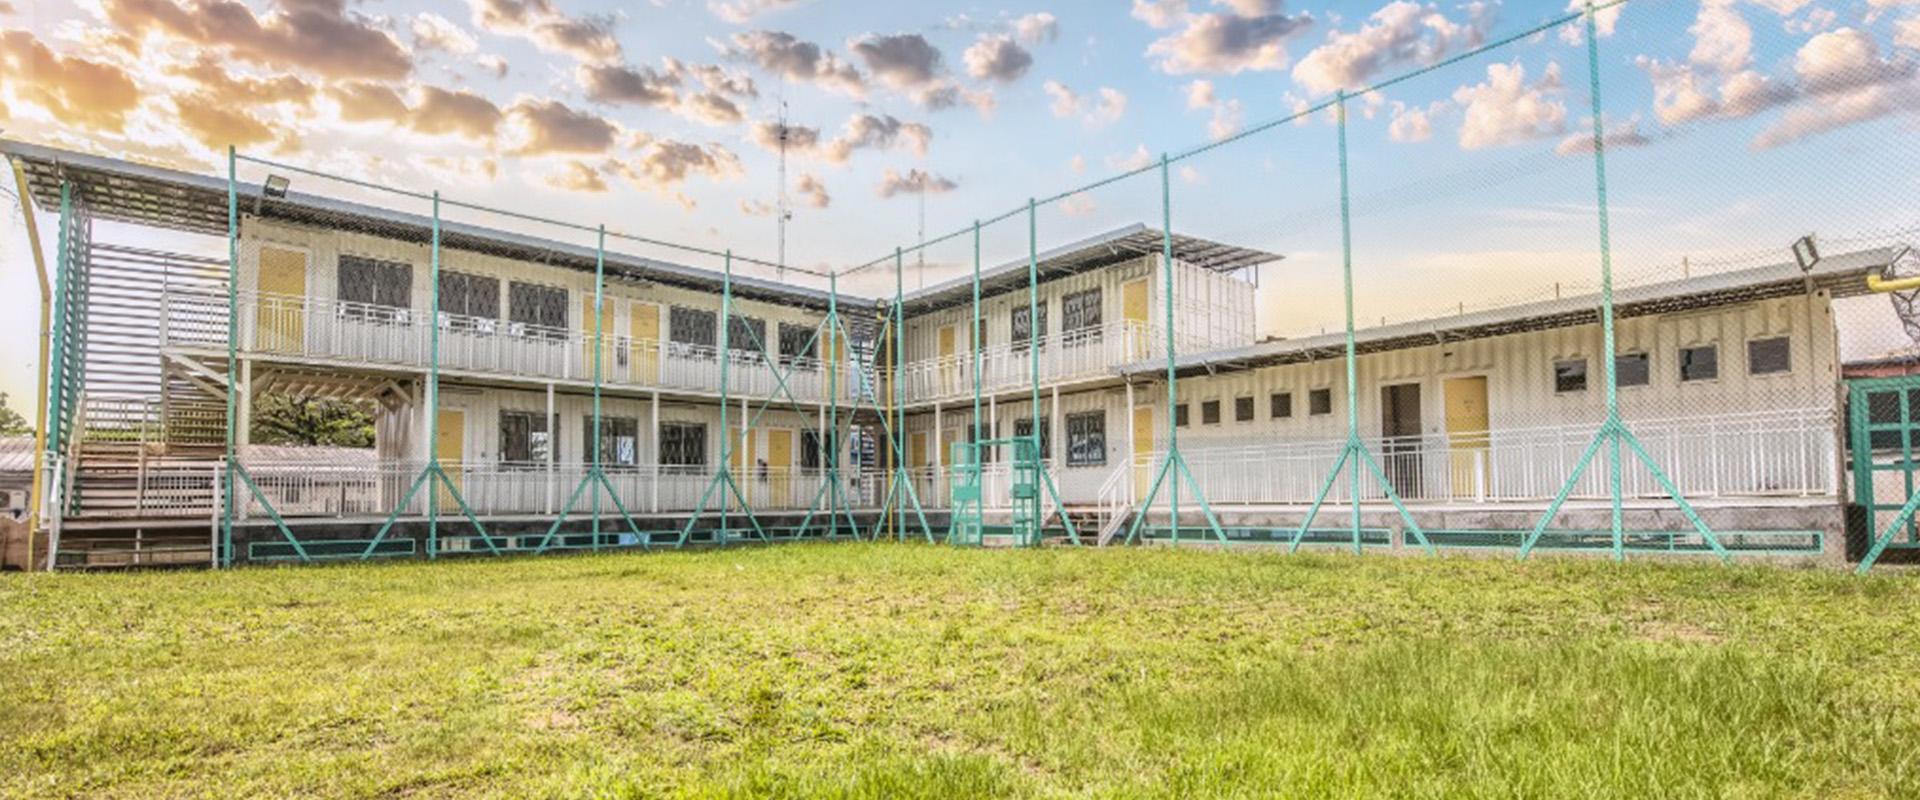 Lycée français Dominique Savio Containers_BBA_barla_architectes_douala_cameroun_1